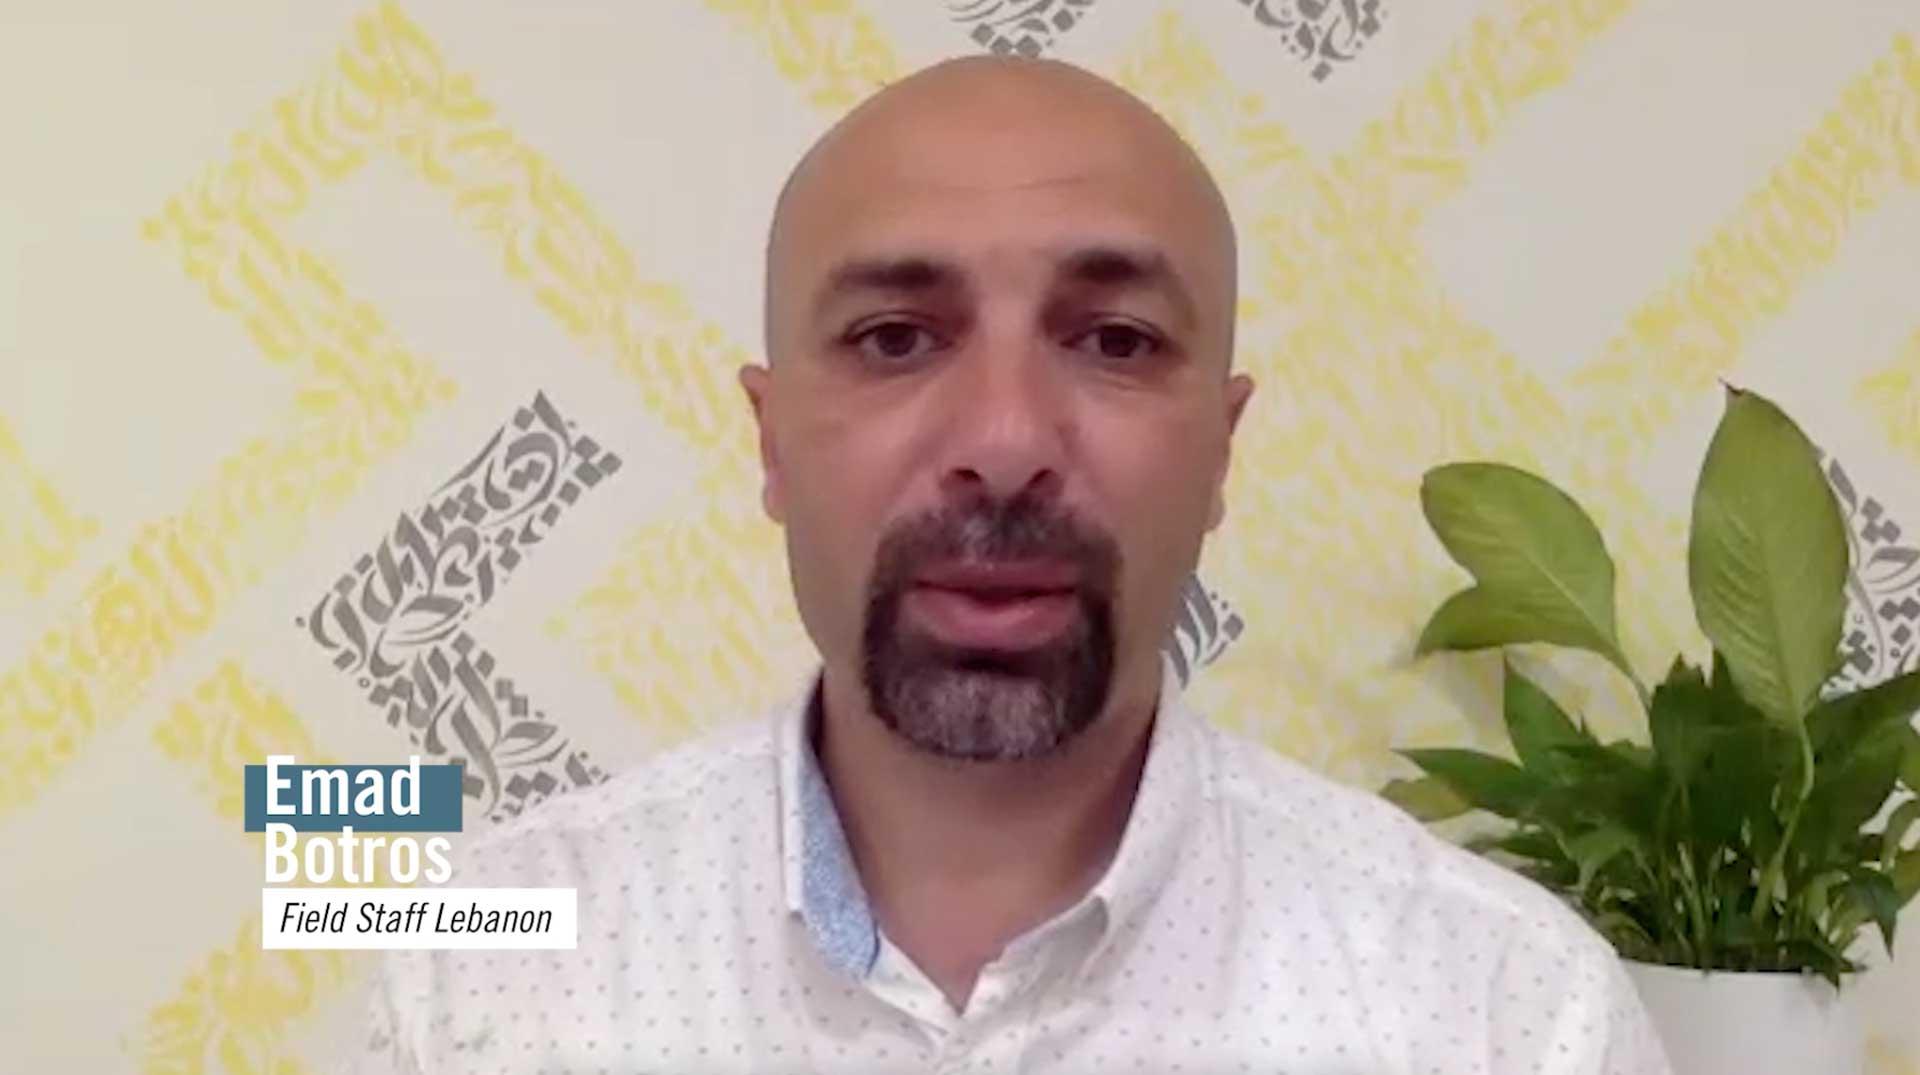 Photo of Emad Botros' Prayerline video